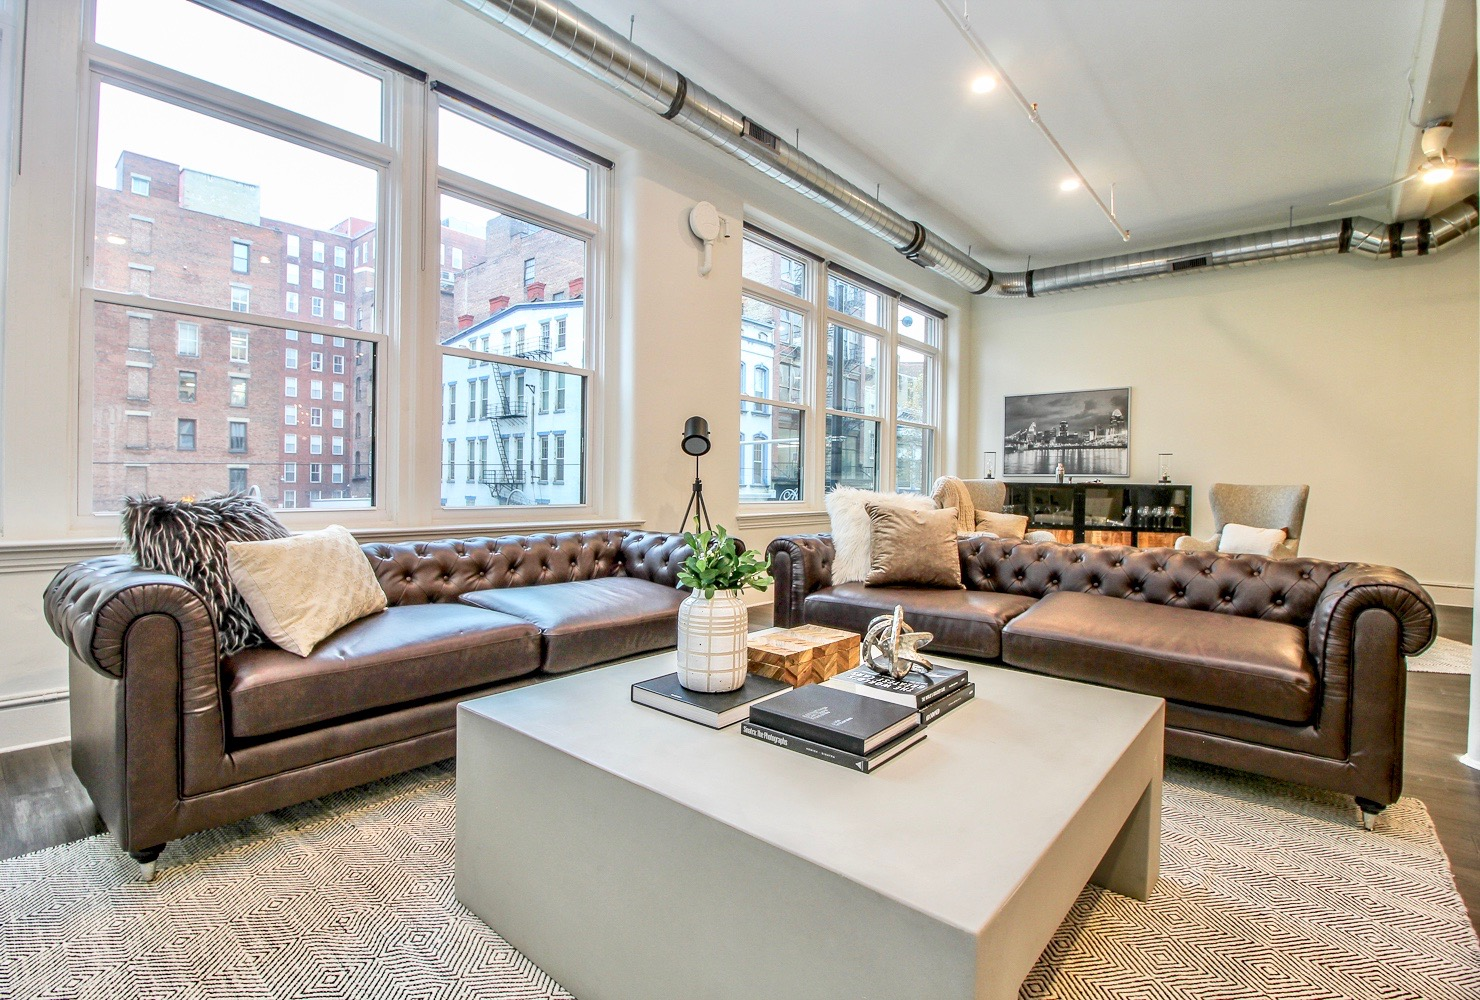 The Lounge Airbnb in Cincinnati